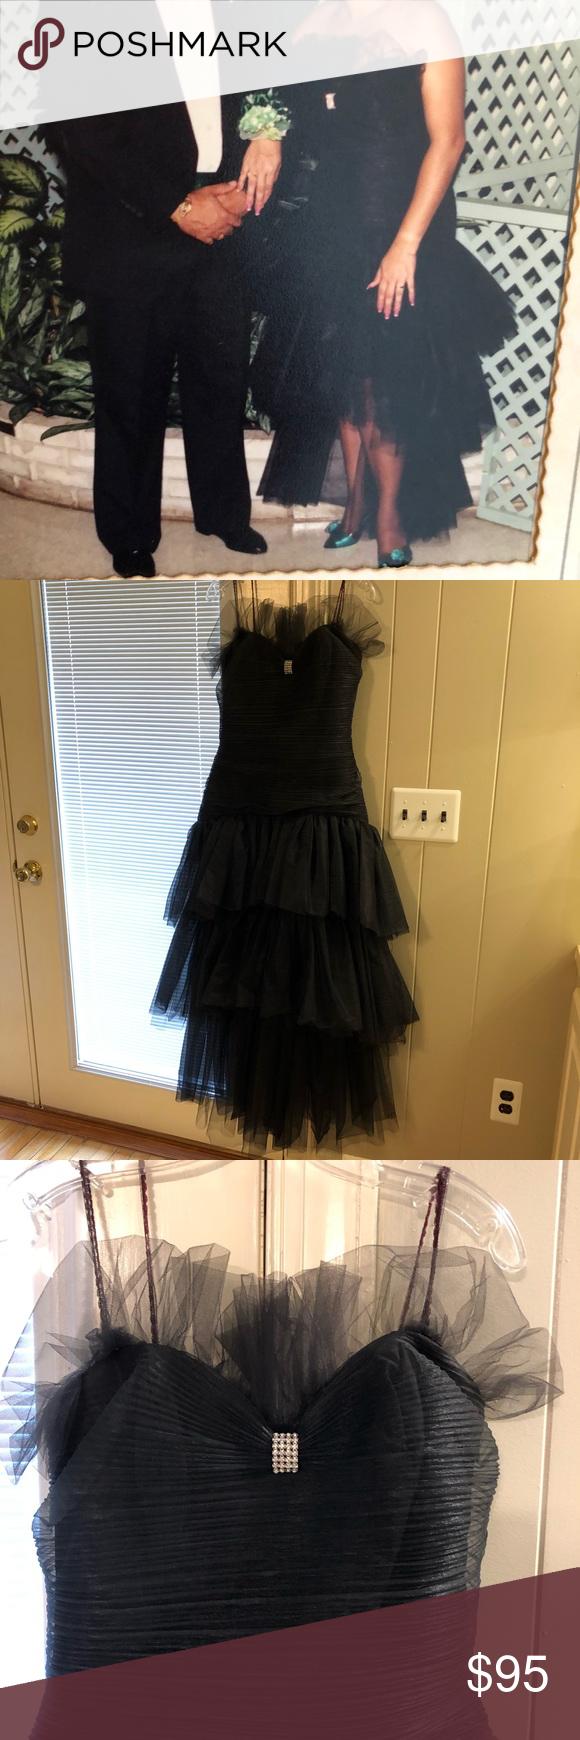 Climax For David Howard Vintage 1989 Party Dress Dresses Clothes Design Party Dress [ 1740 x 580 Pixel ]